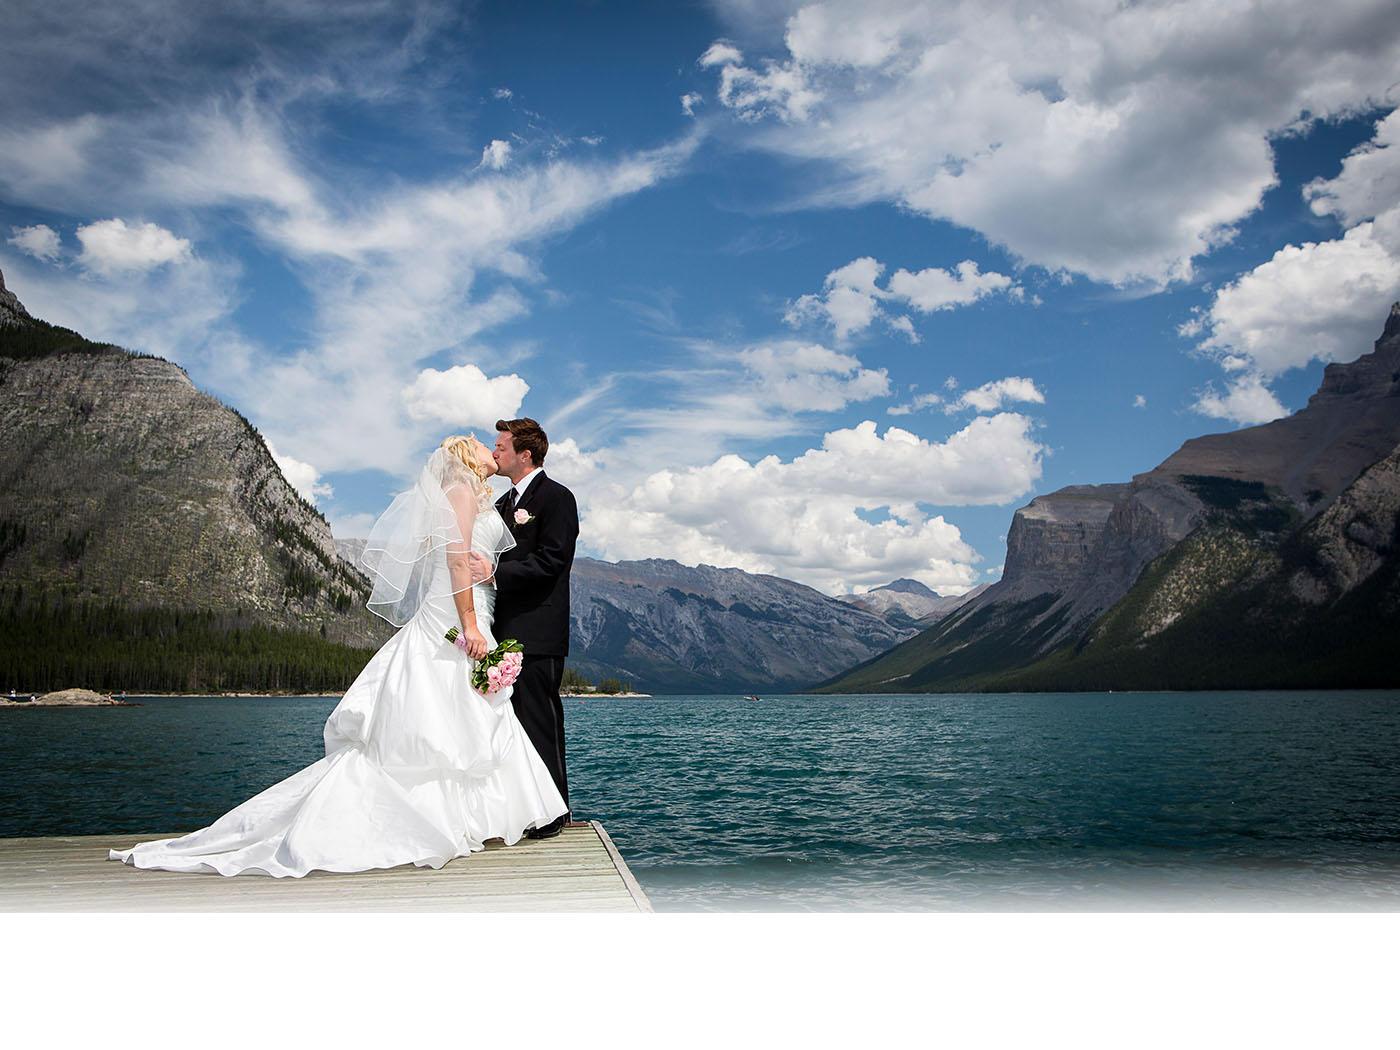 Weddings At Banff Banff Weddings From Perfect Weddings Abroad